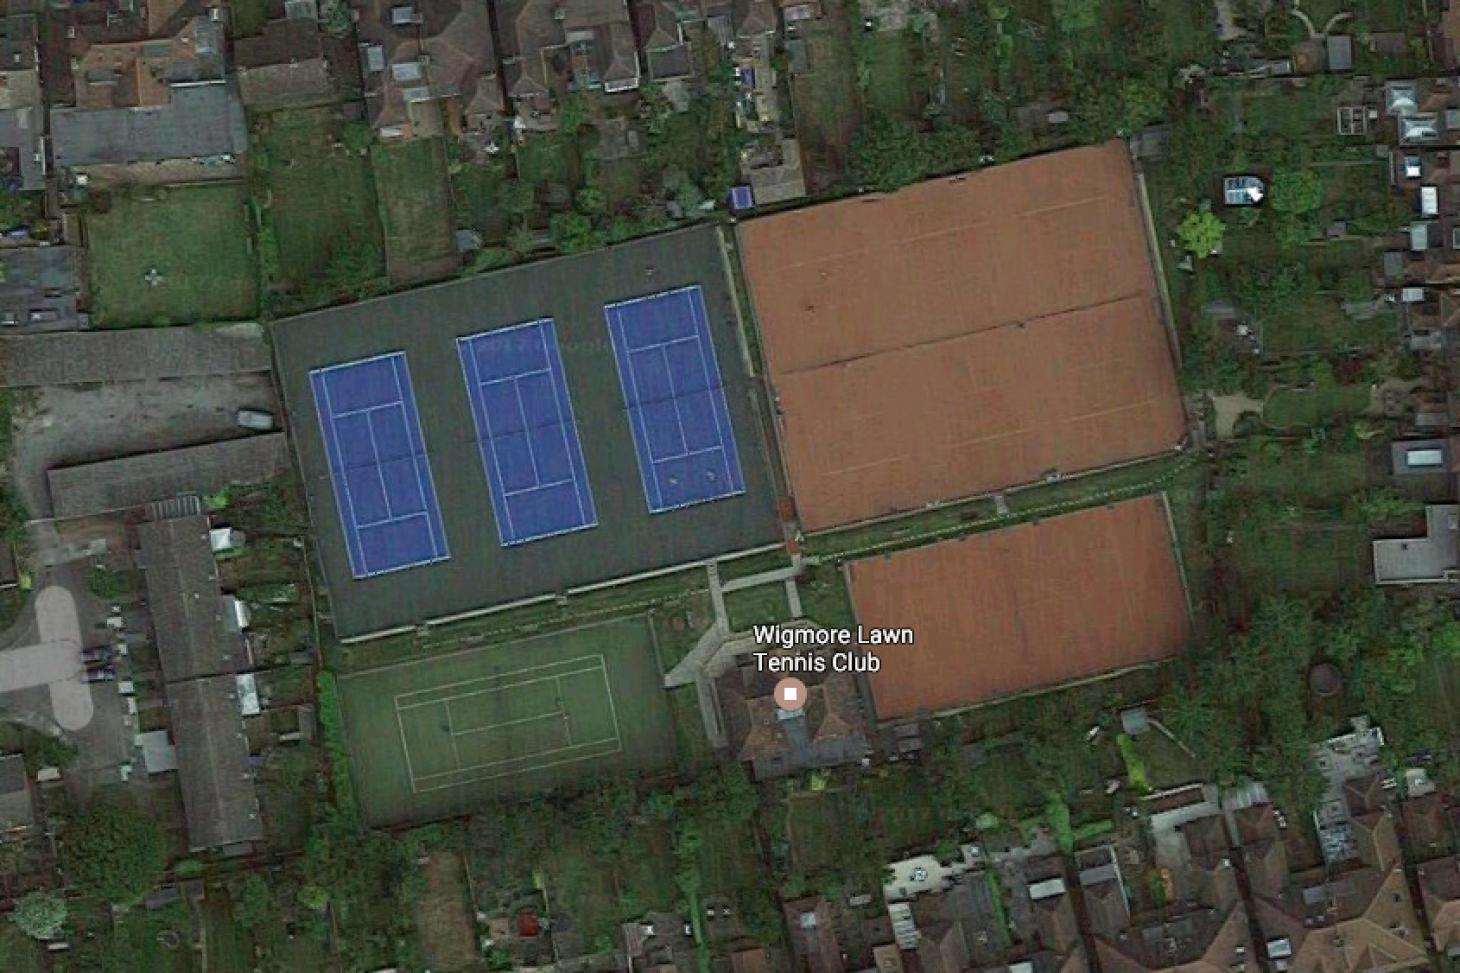 Wigmore Lawn Tennis Club Outdoor | Astroturf tennis court